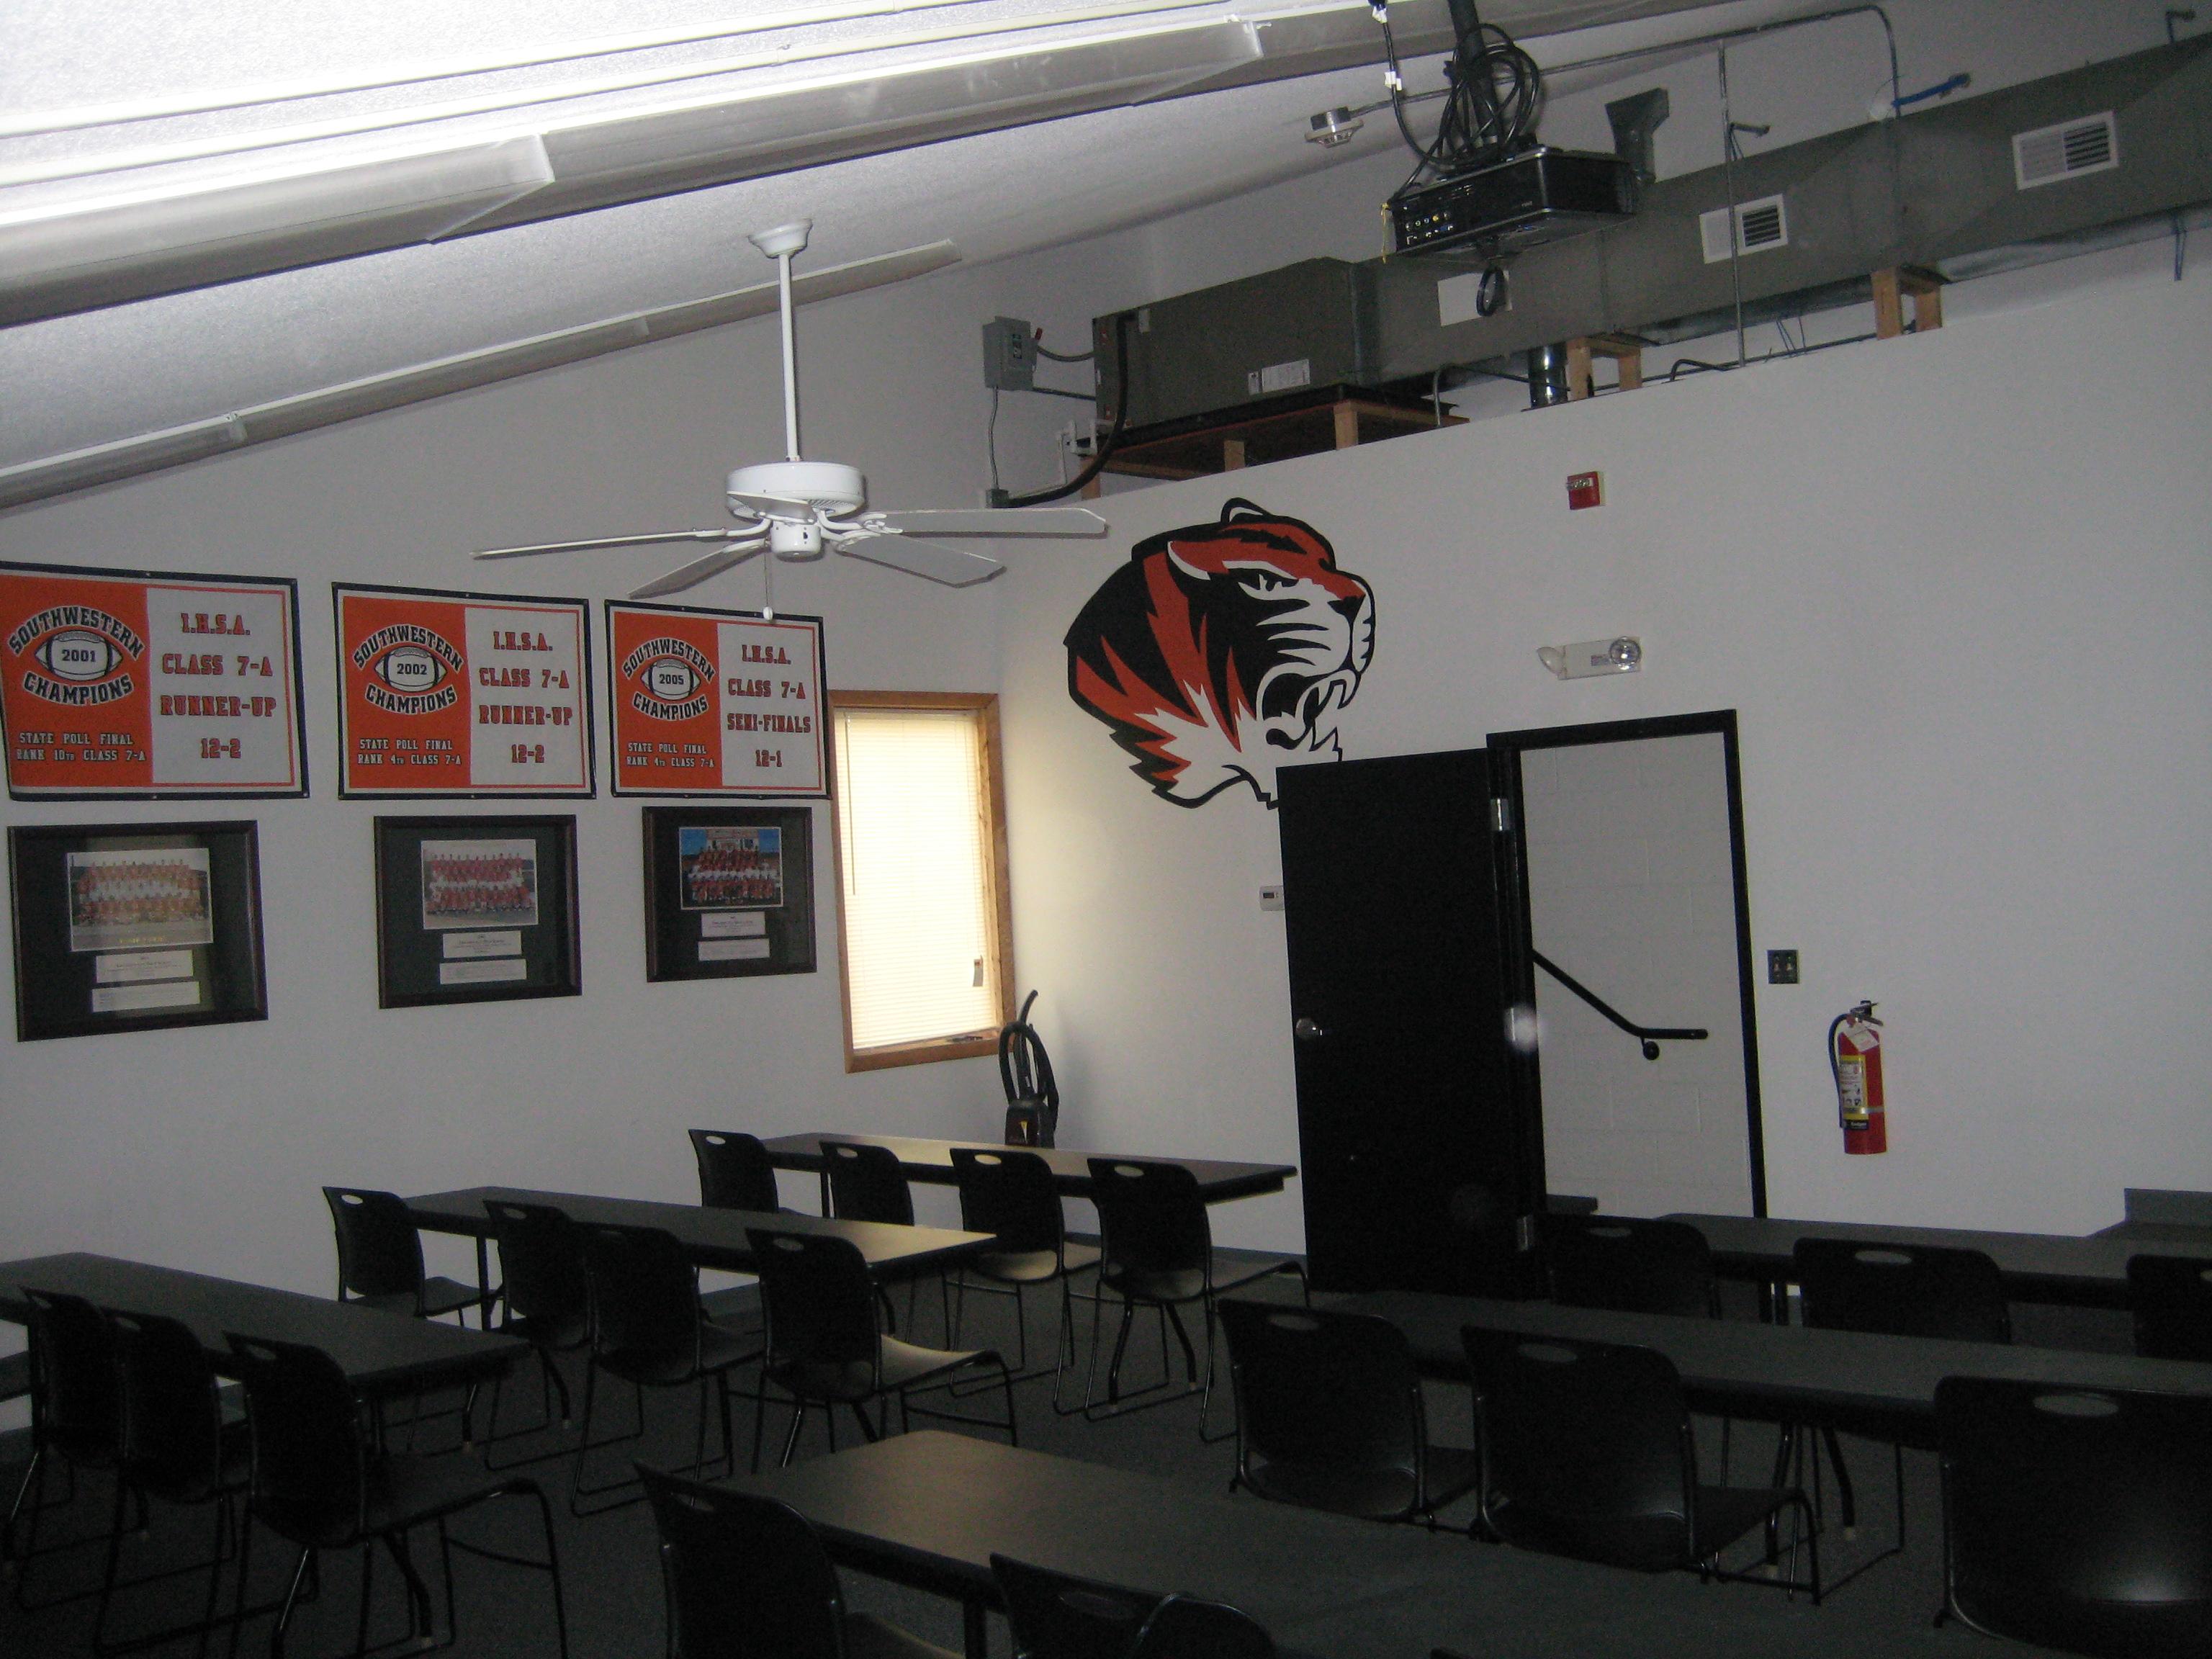 Film Room 1